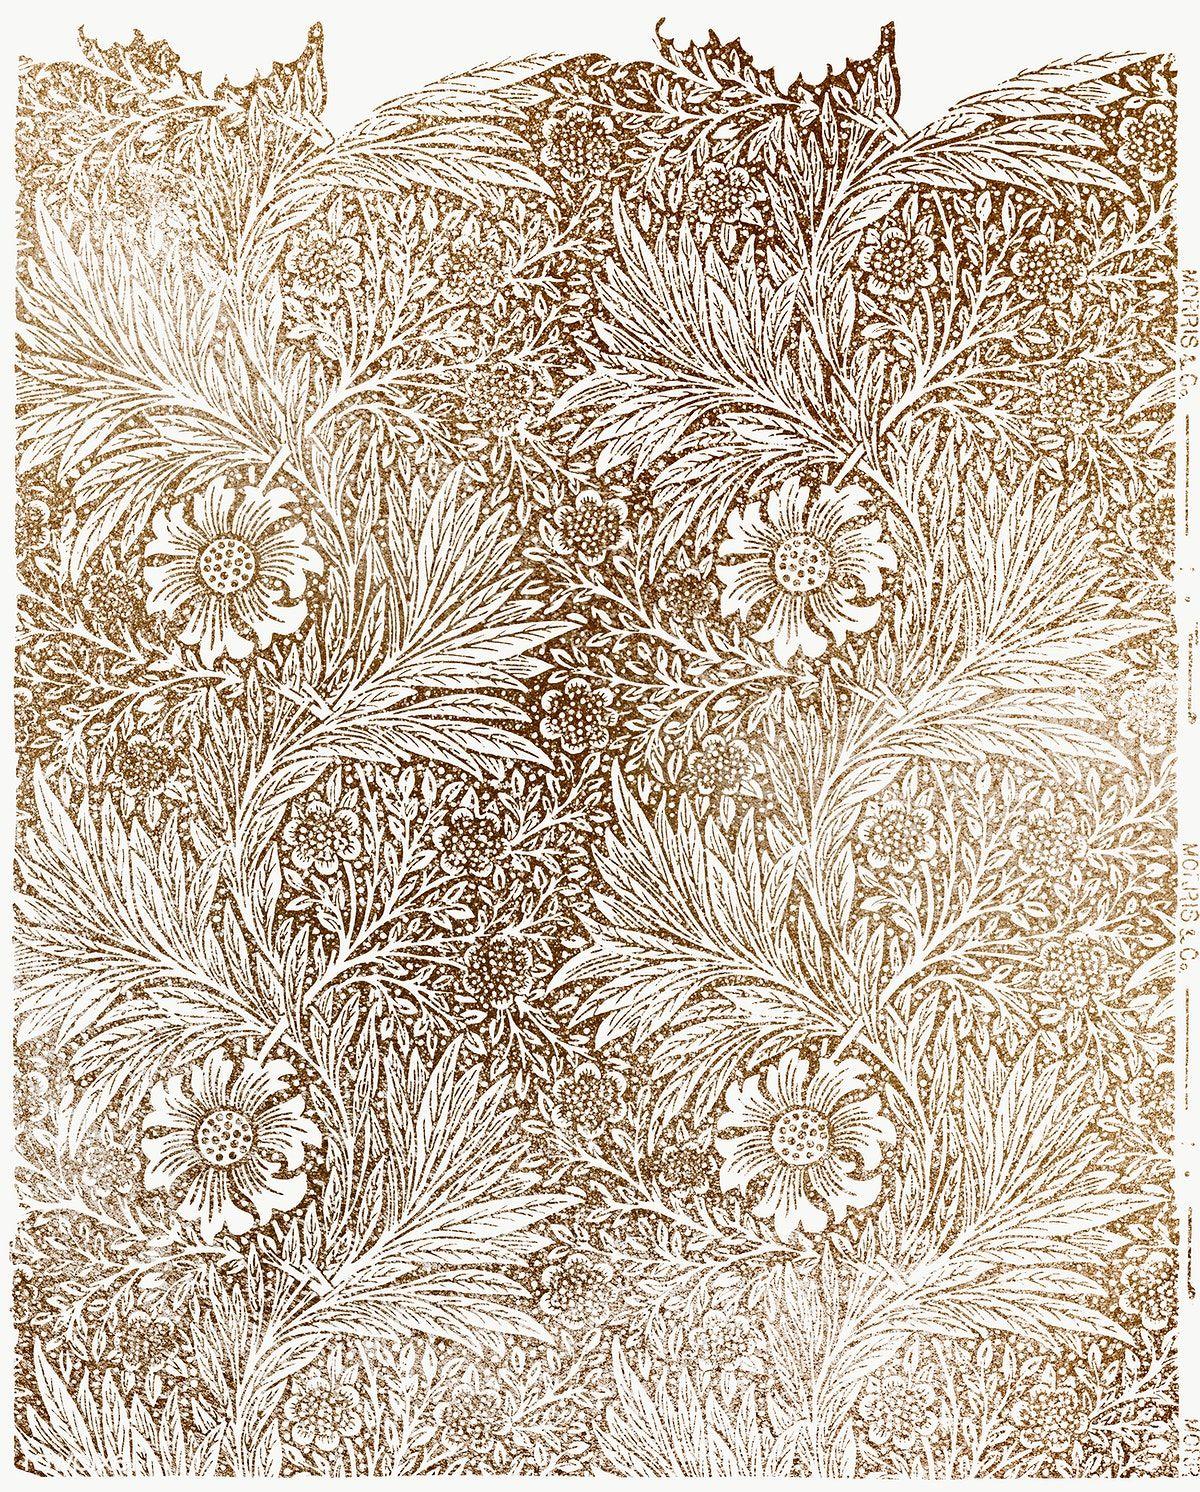 Download Premium Png Of Marigold Wallpaper Vintage Design Remix From In 2020 Wallpapers Vintage Art Wallpaper Morris Wallpapers